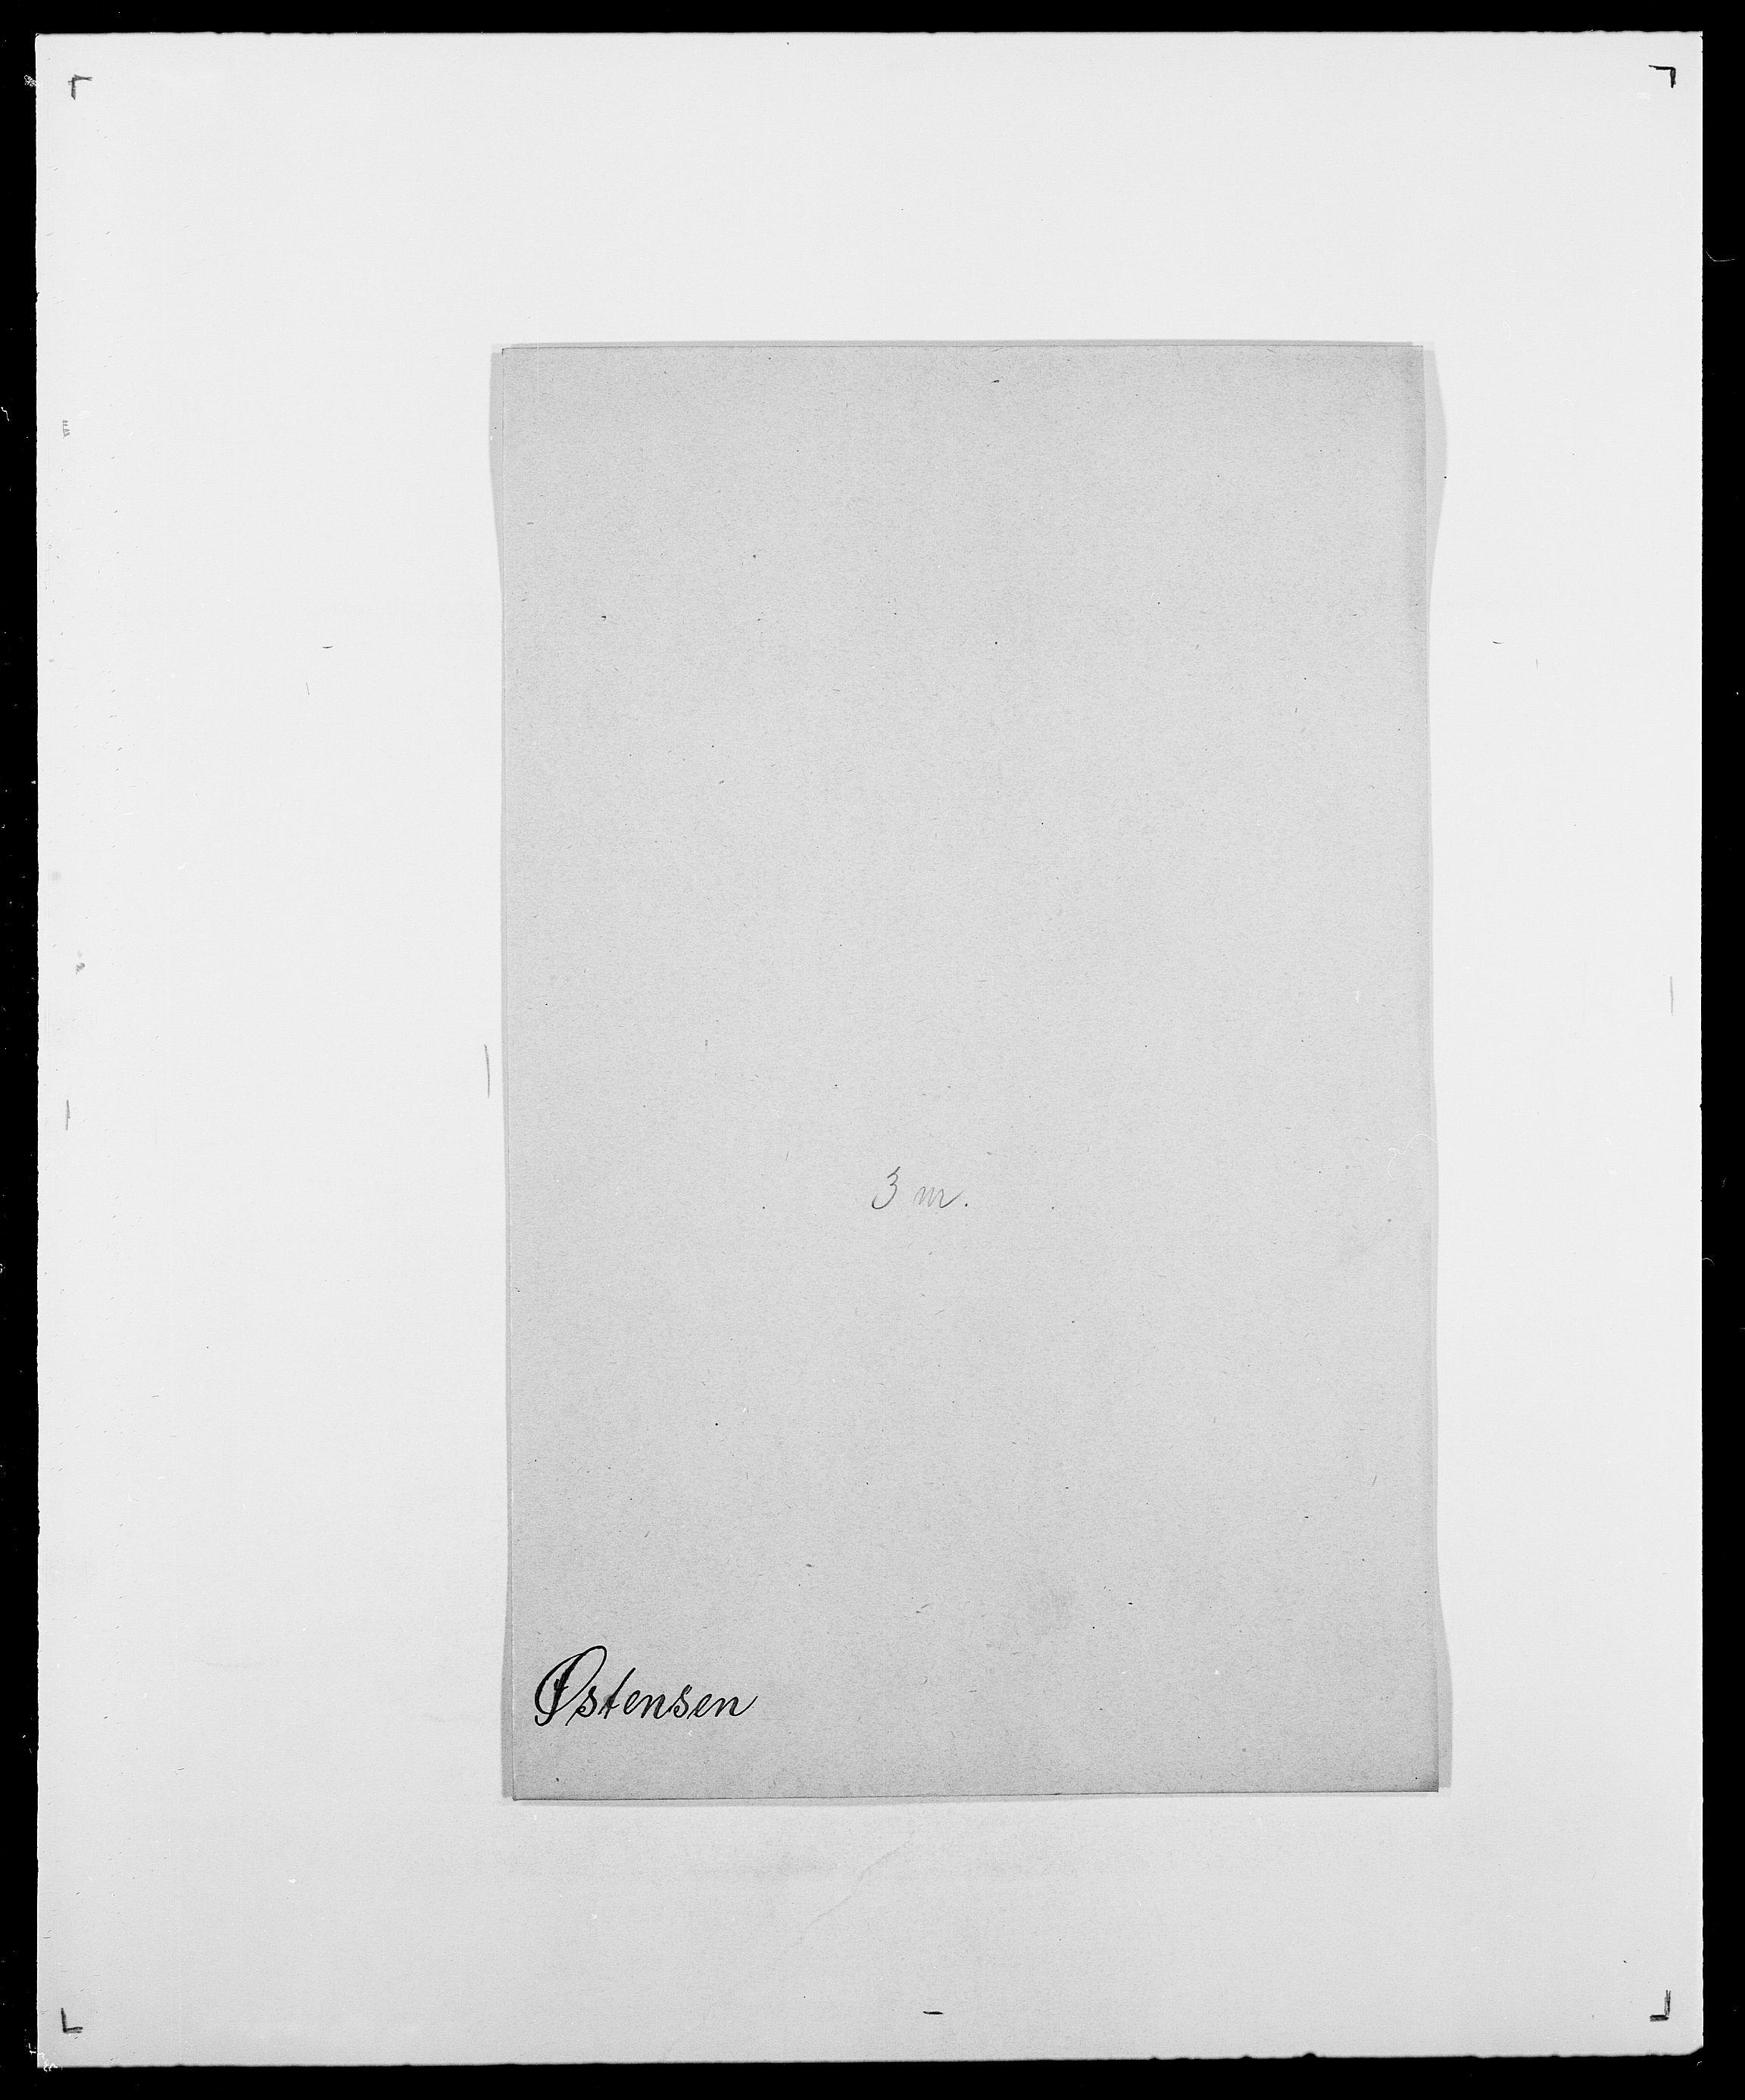 SAO, Delgobe, Charles Antoine - samling, D/Da/L0043: Wulfsberg - v. Zanten, s. 350